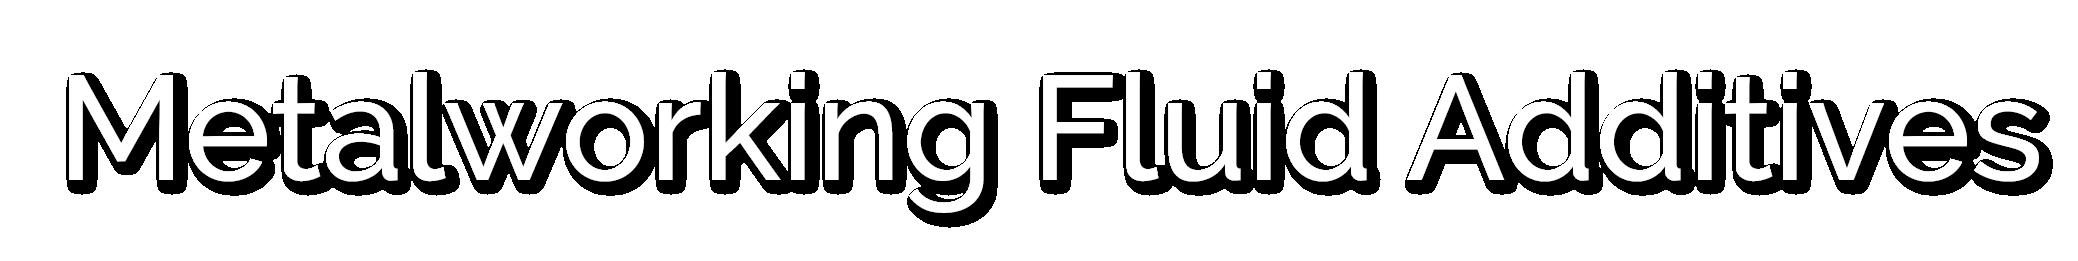 Metalworking Fluid Additives